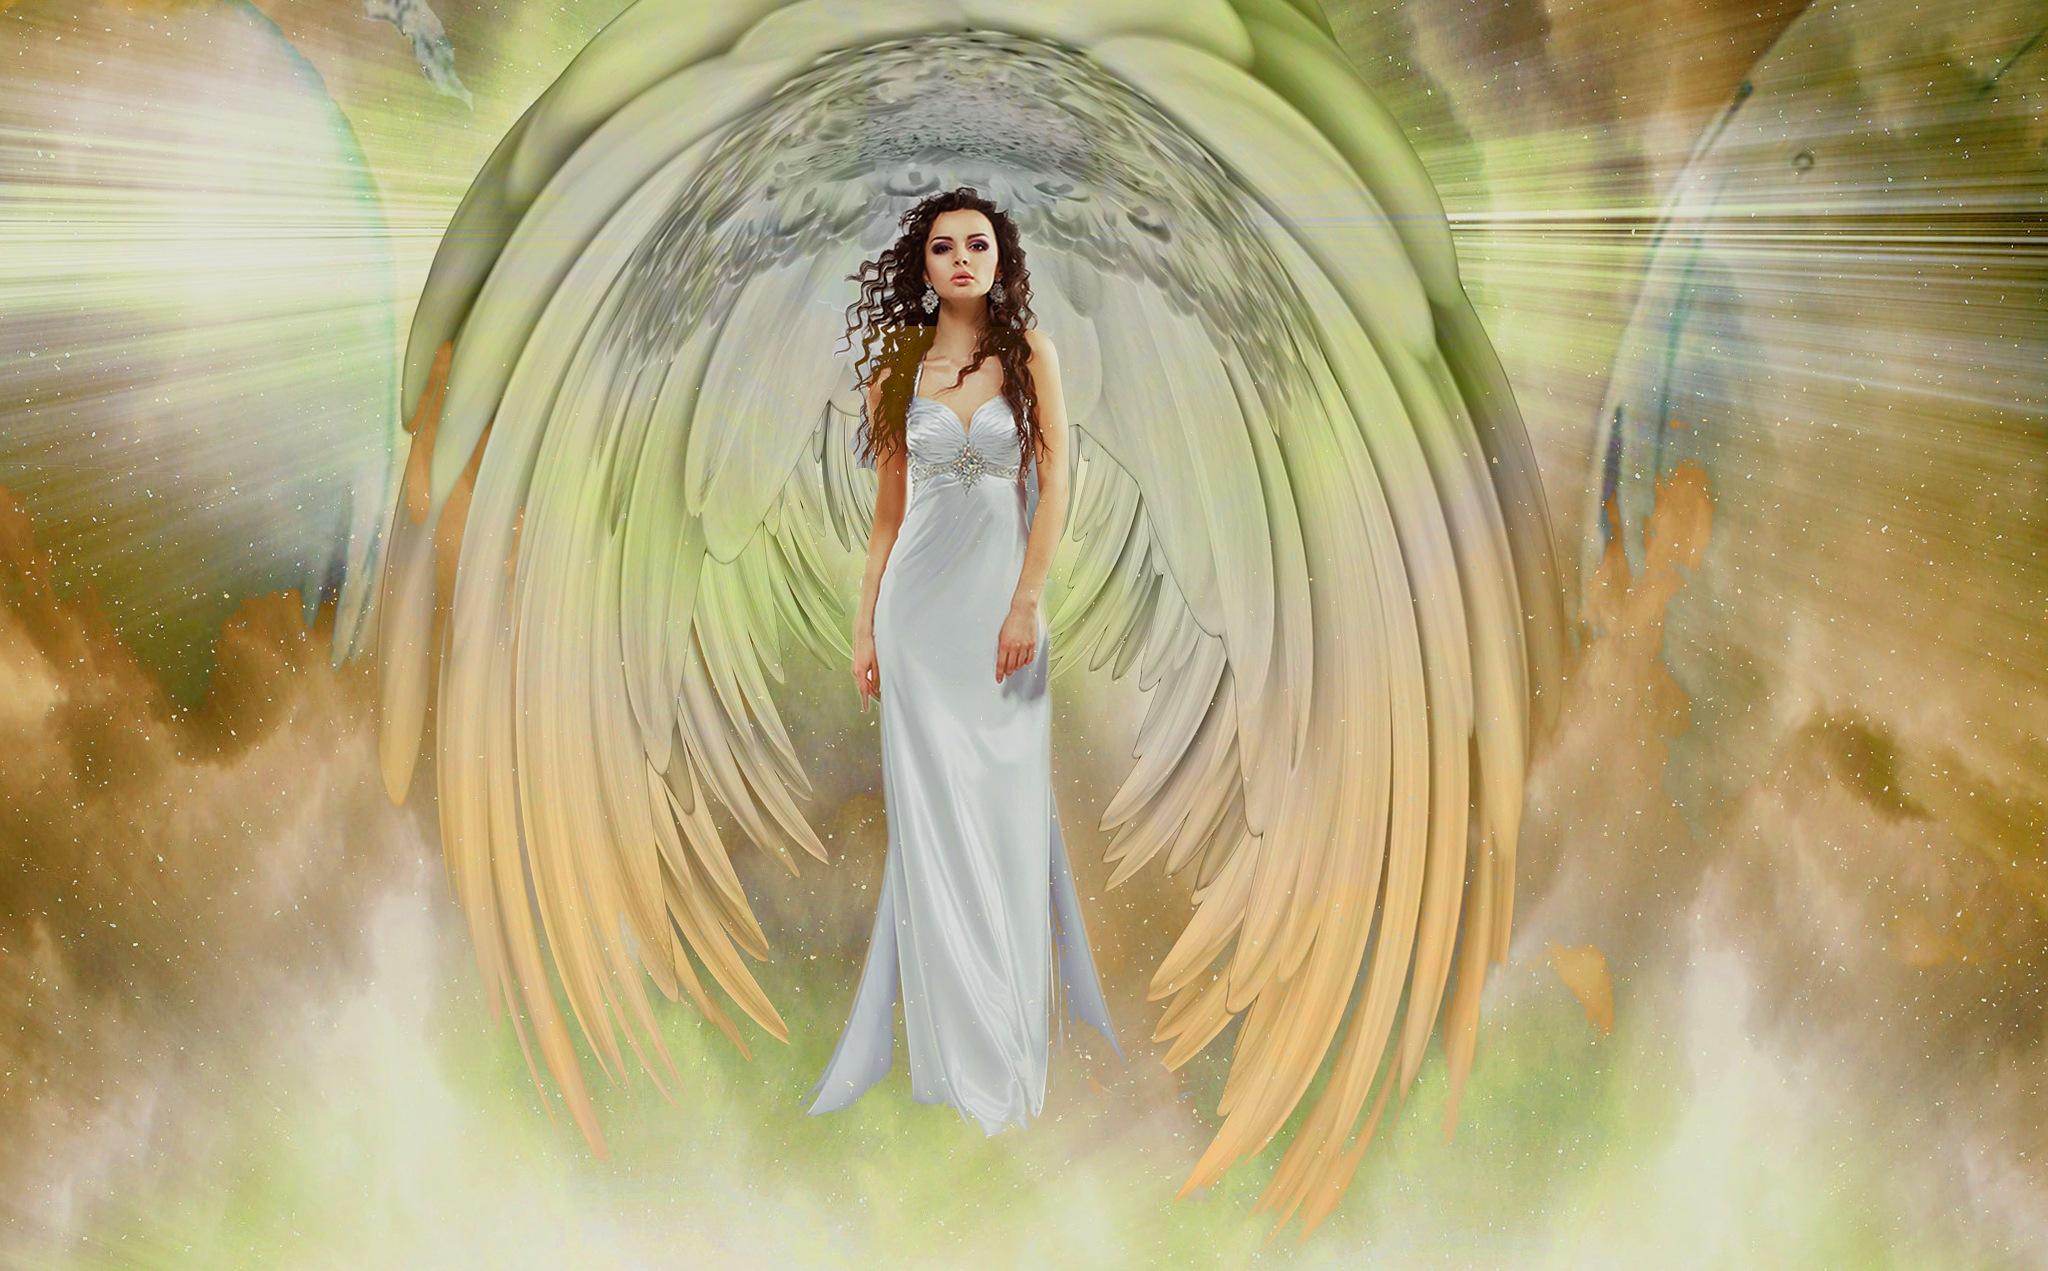 creative with photos by Cor.G.  Amature Photographer